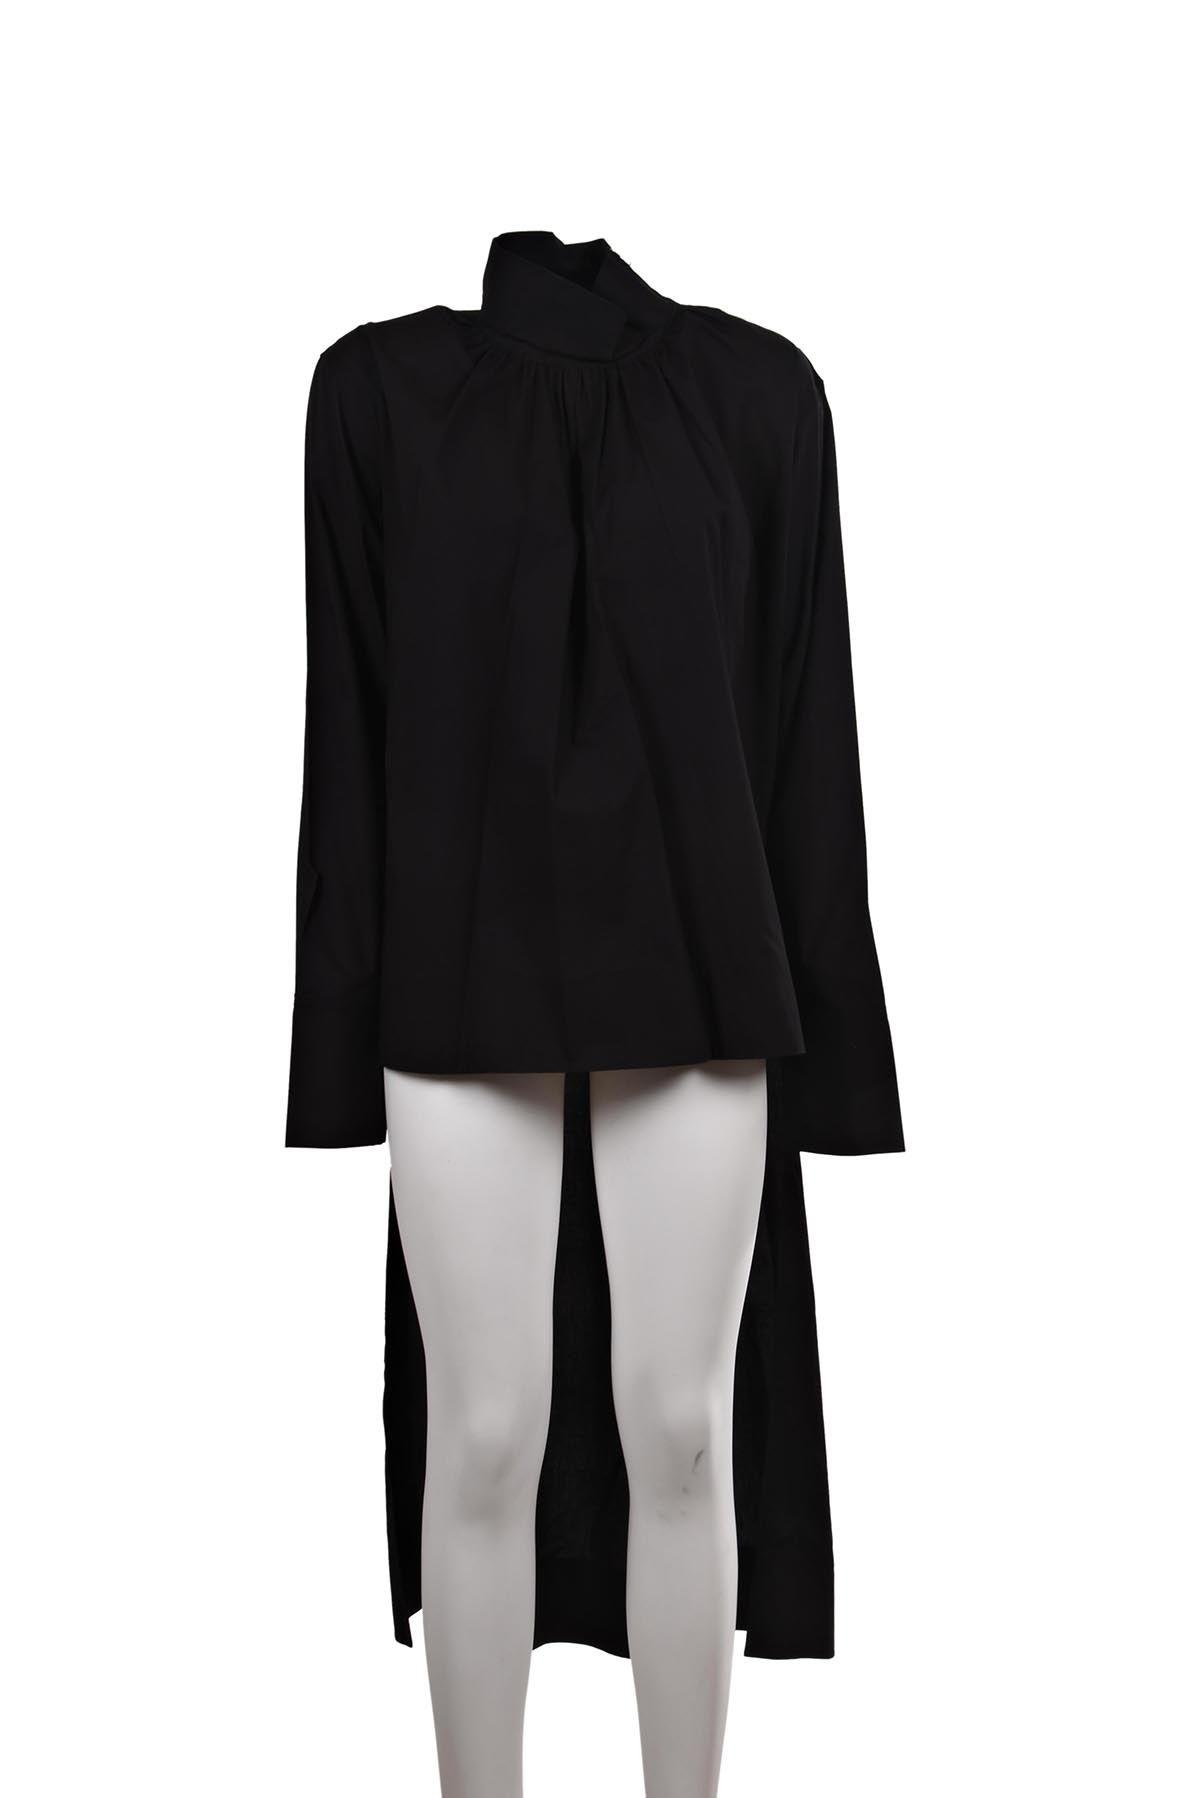 Celine Asymmetrical Long Top